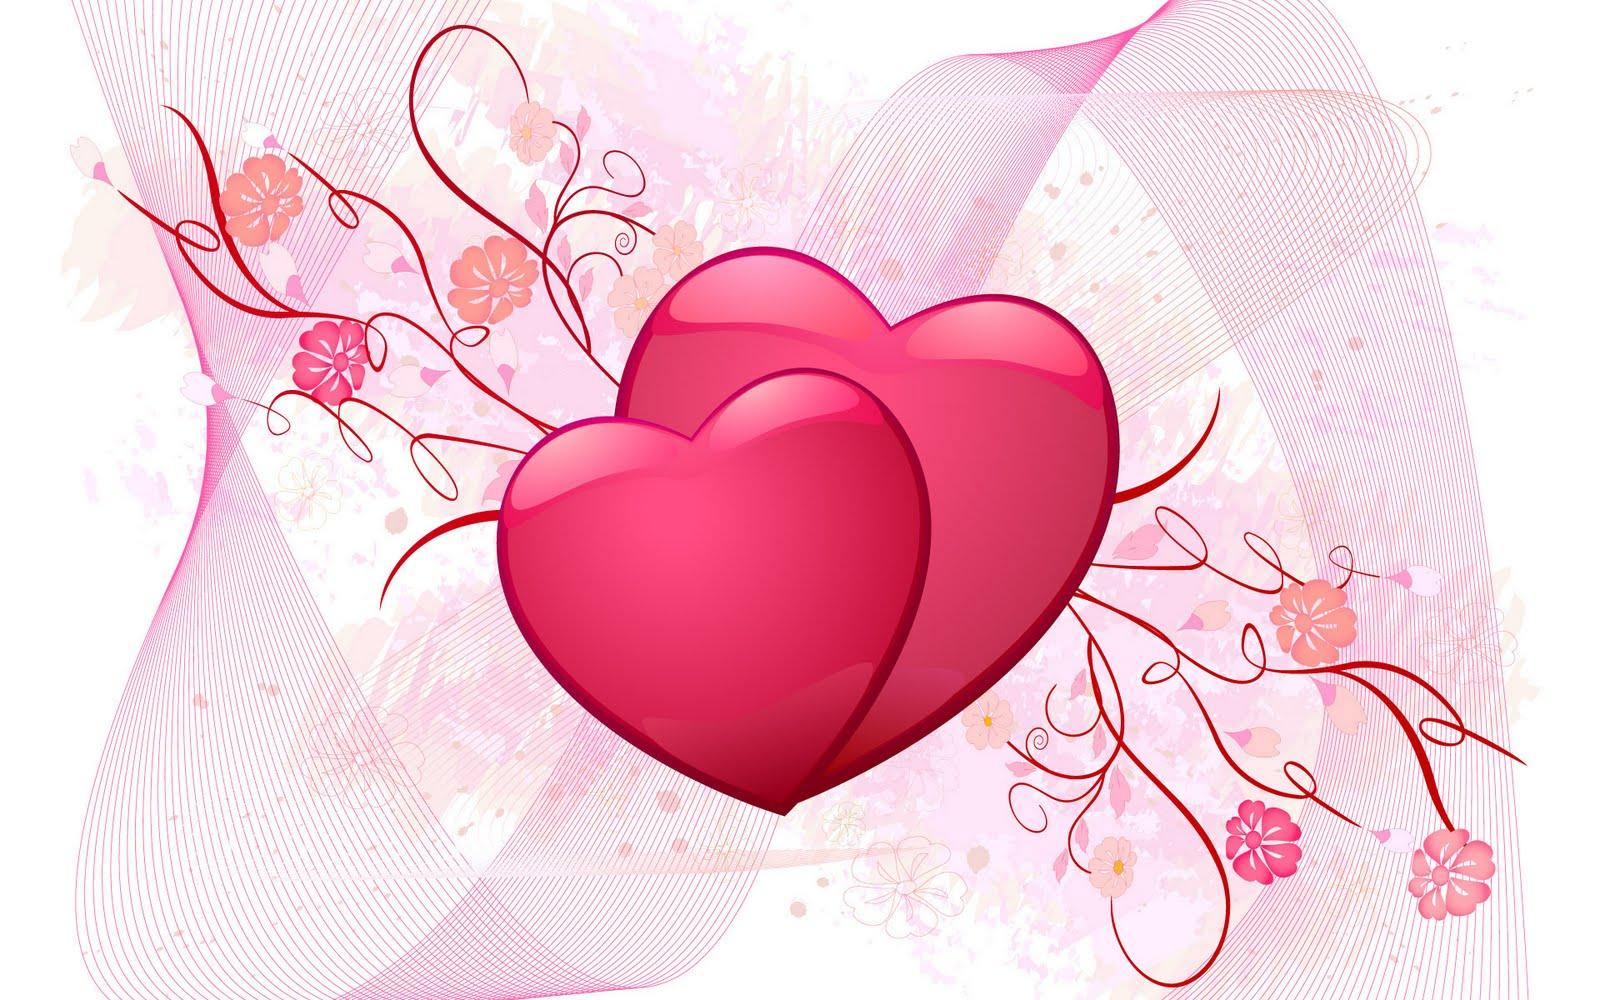 http://3.bp.blogspot.com/-scHae24FTJE/Tpek3PaJXII/AAAAAAAAAzg/uihJ1YjRopI/s1600/Love-wallpaper-love-4187609-1920-1200.jpg